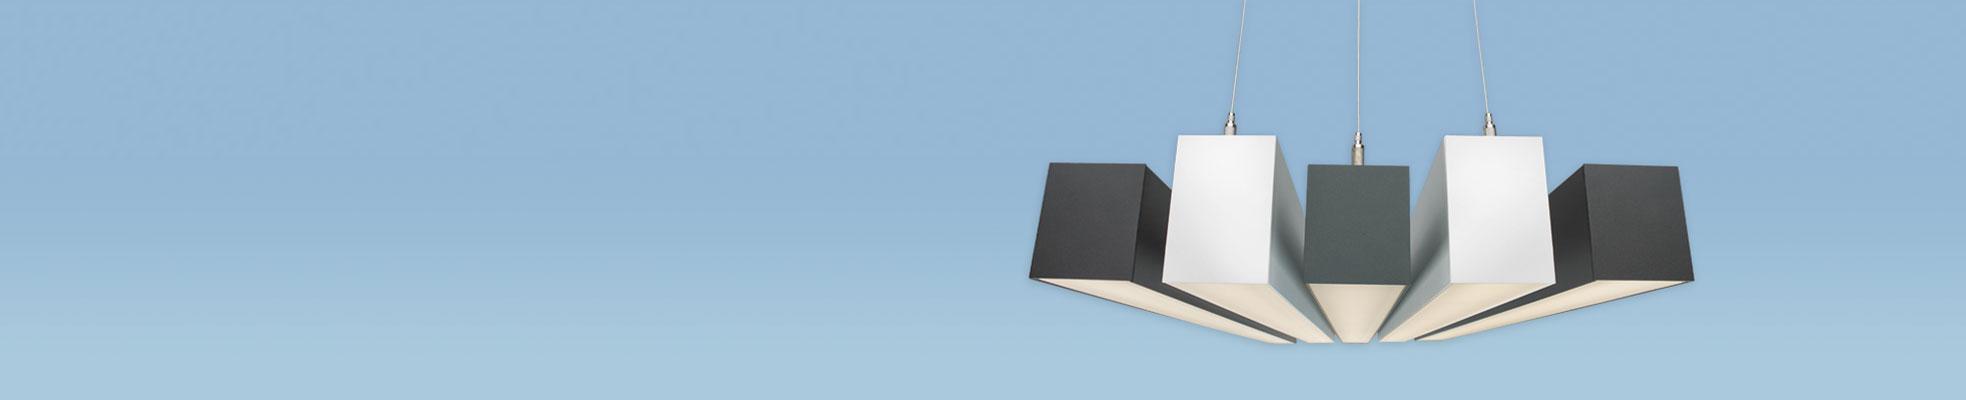 Linear Lighting Simplified: Design. Order. Install.